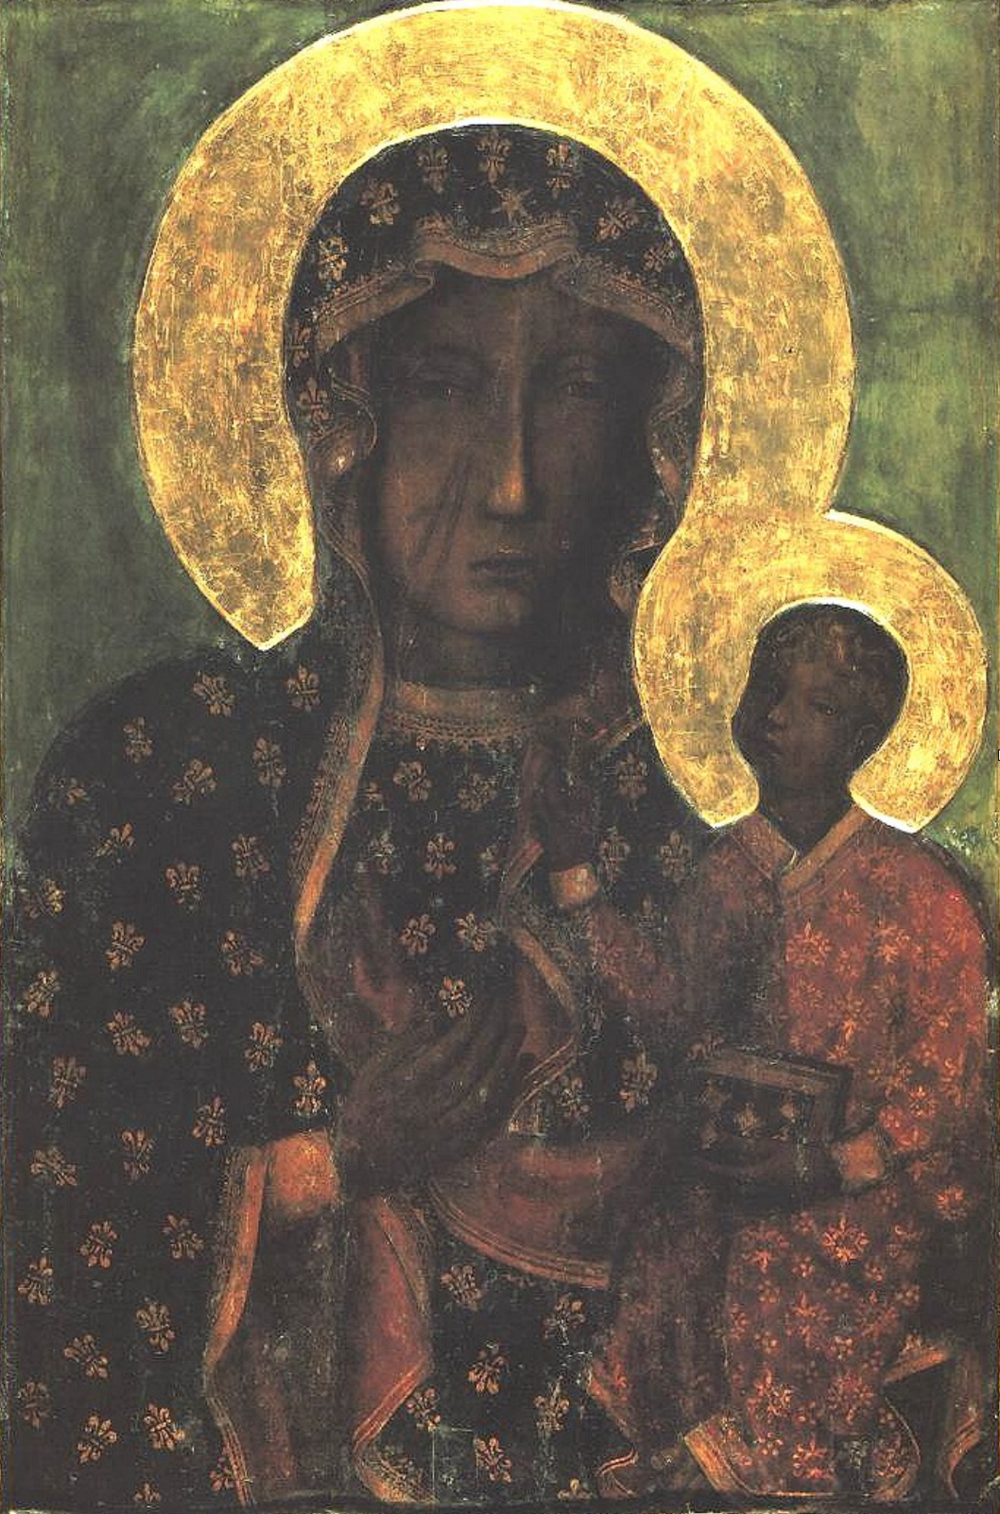 Black Madonna of Czestochowska